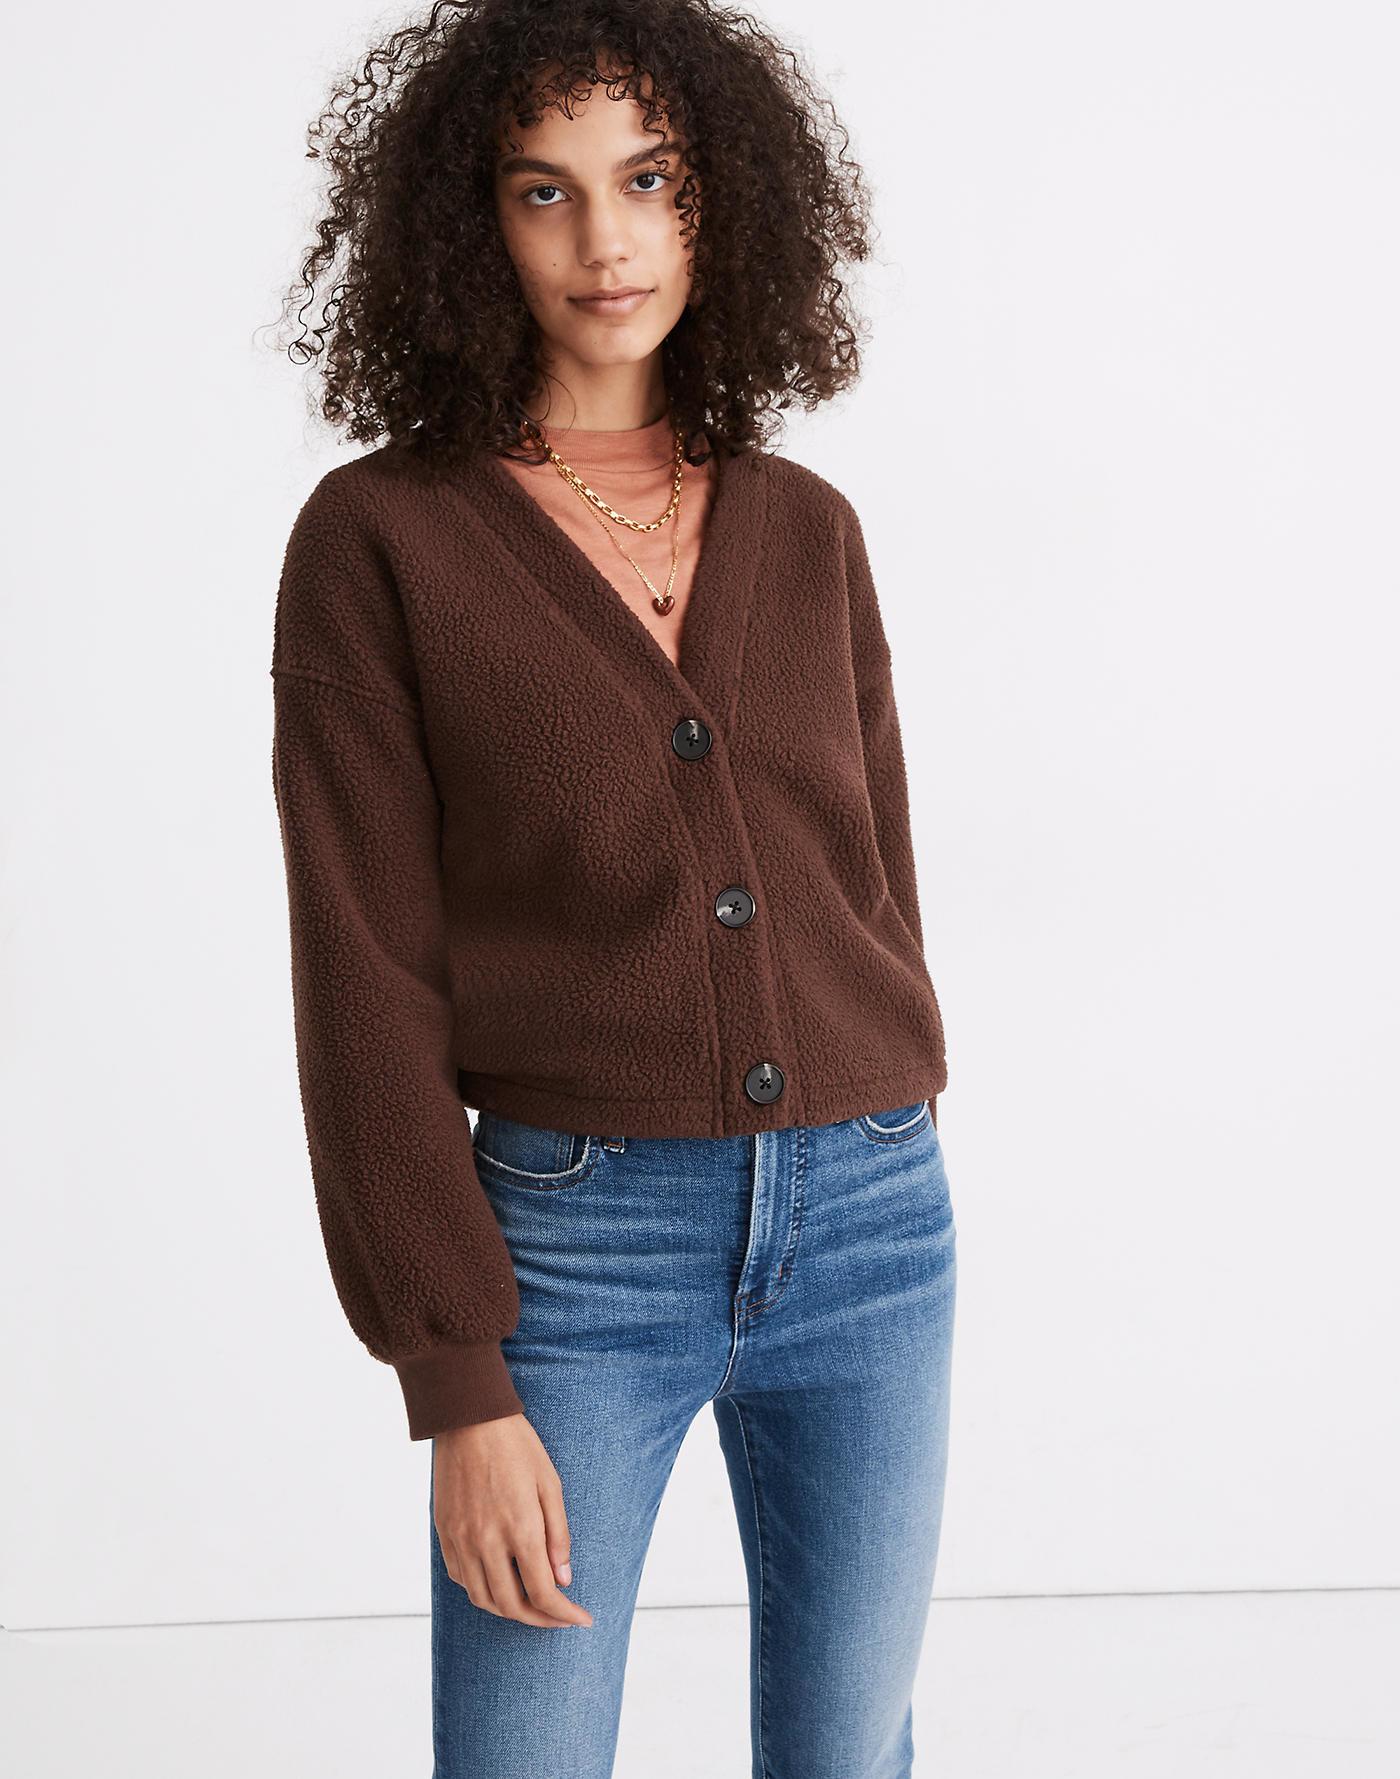 Model wearing fuzzy brown cardigan